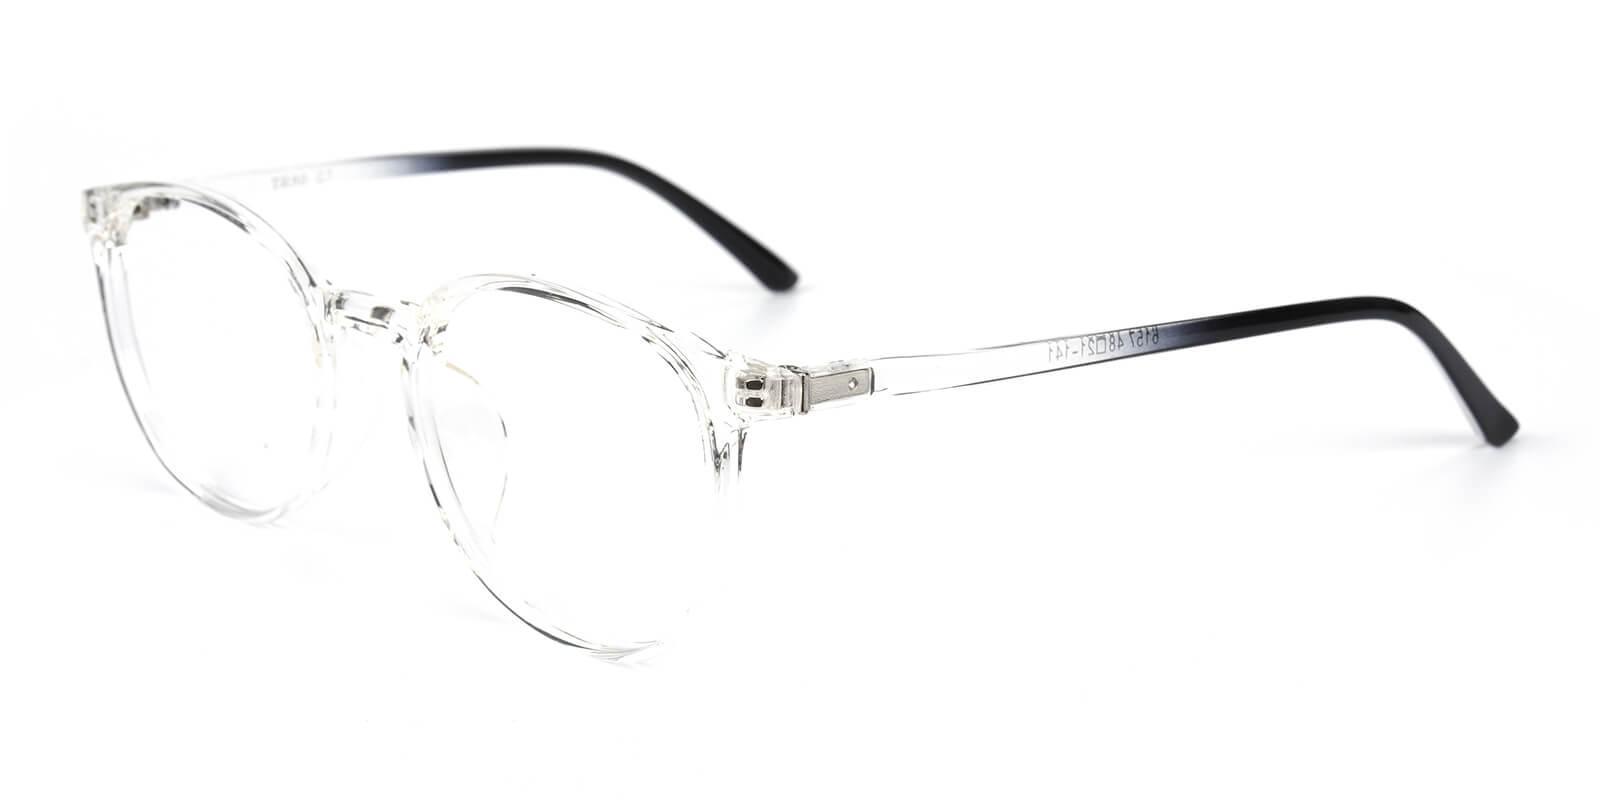 Aure-Translucent-Round-TR-Eyeglasses-additional1